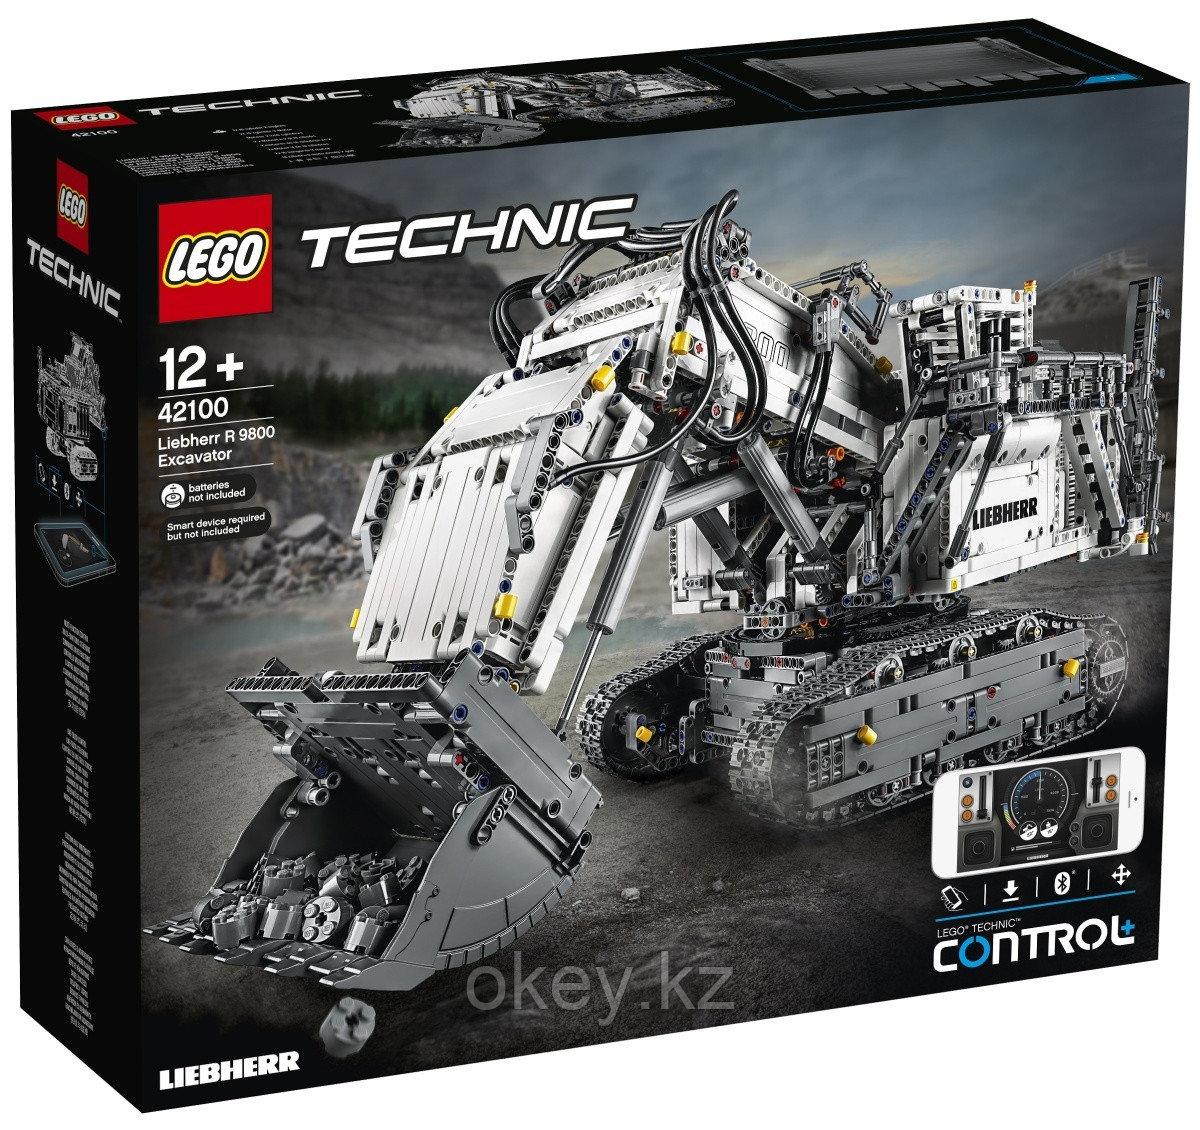 LEGO Technic: Экскаватор Liebherr R 9800 42100